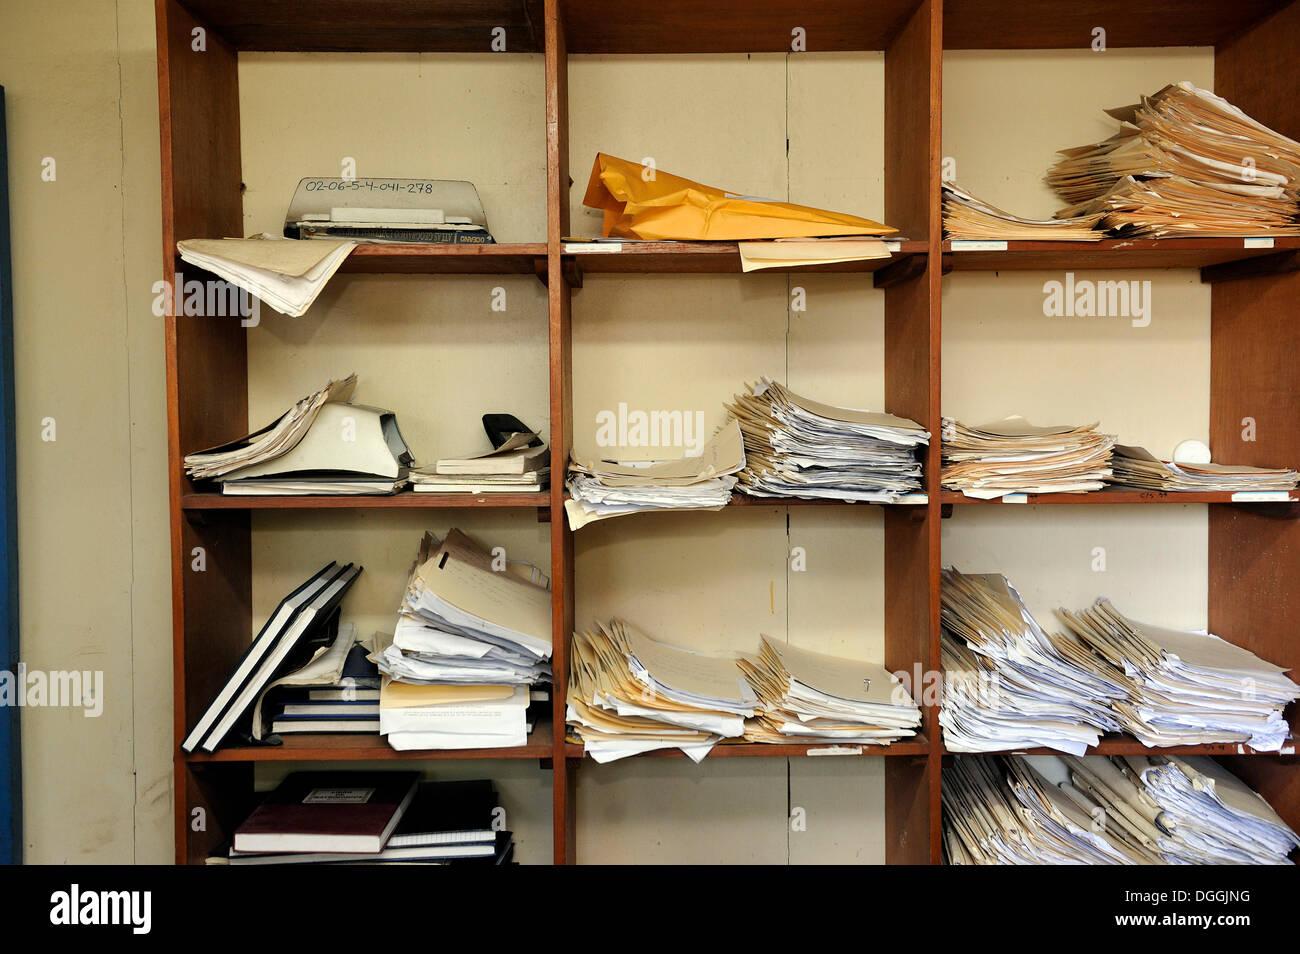 Grundlegende Regal mit Dokumenten auf einem Polizeirevier, La Sabanita, Masaya, Nicaragua, Mittelamerika Stockbild